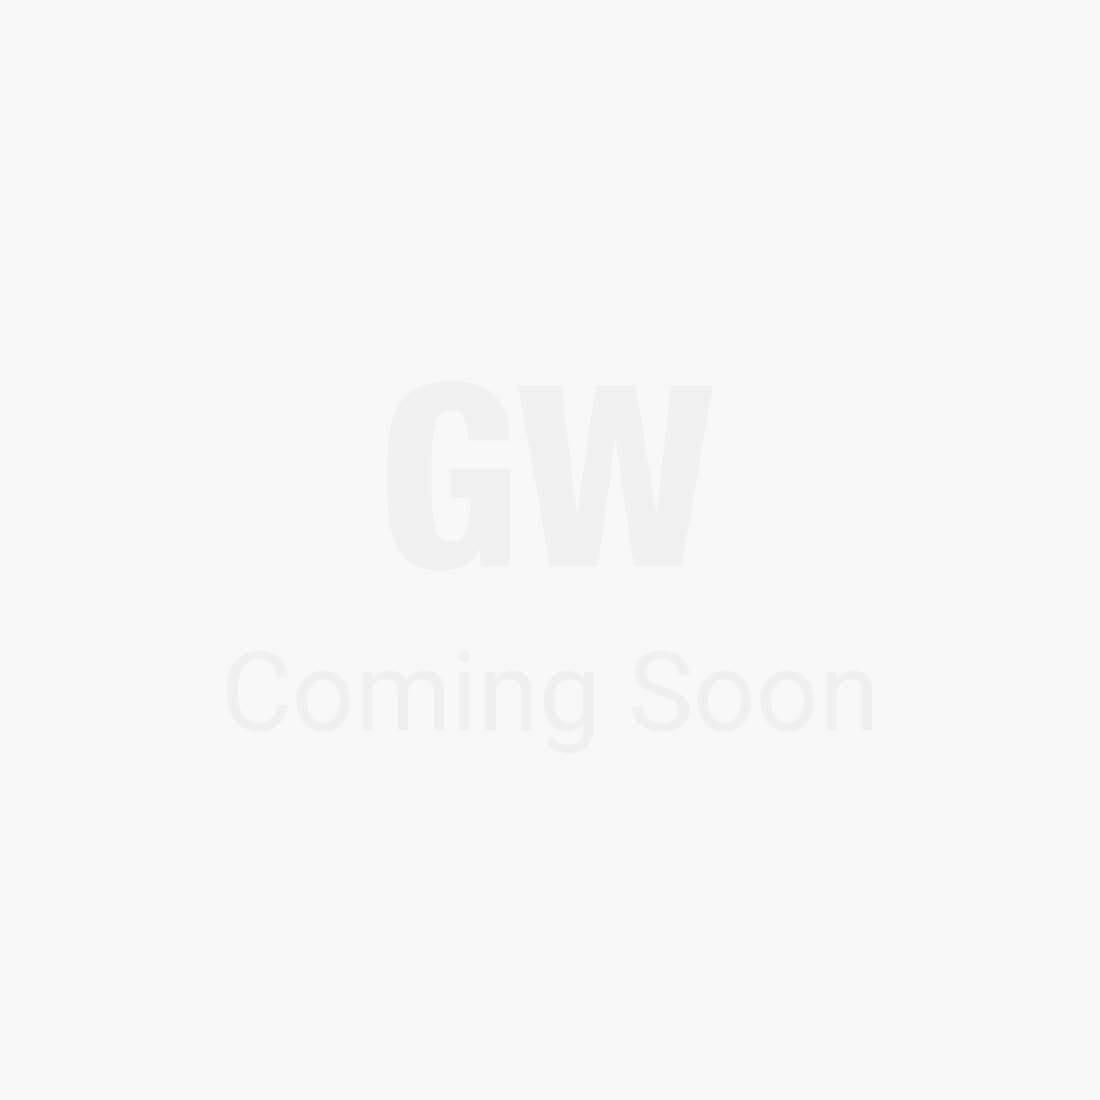 Baha Sofa Lounge Chair